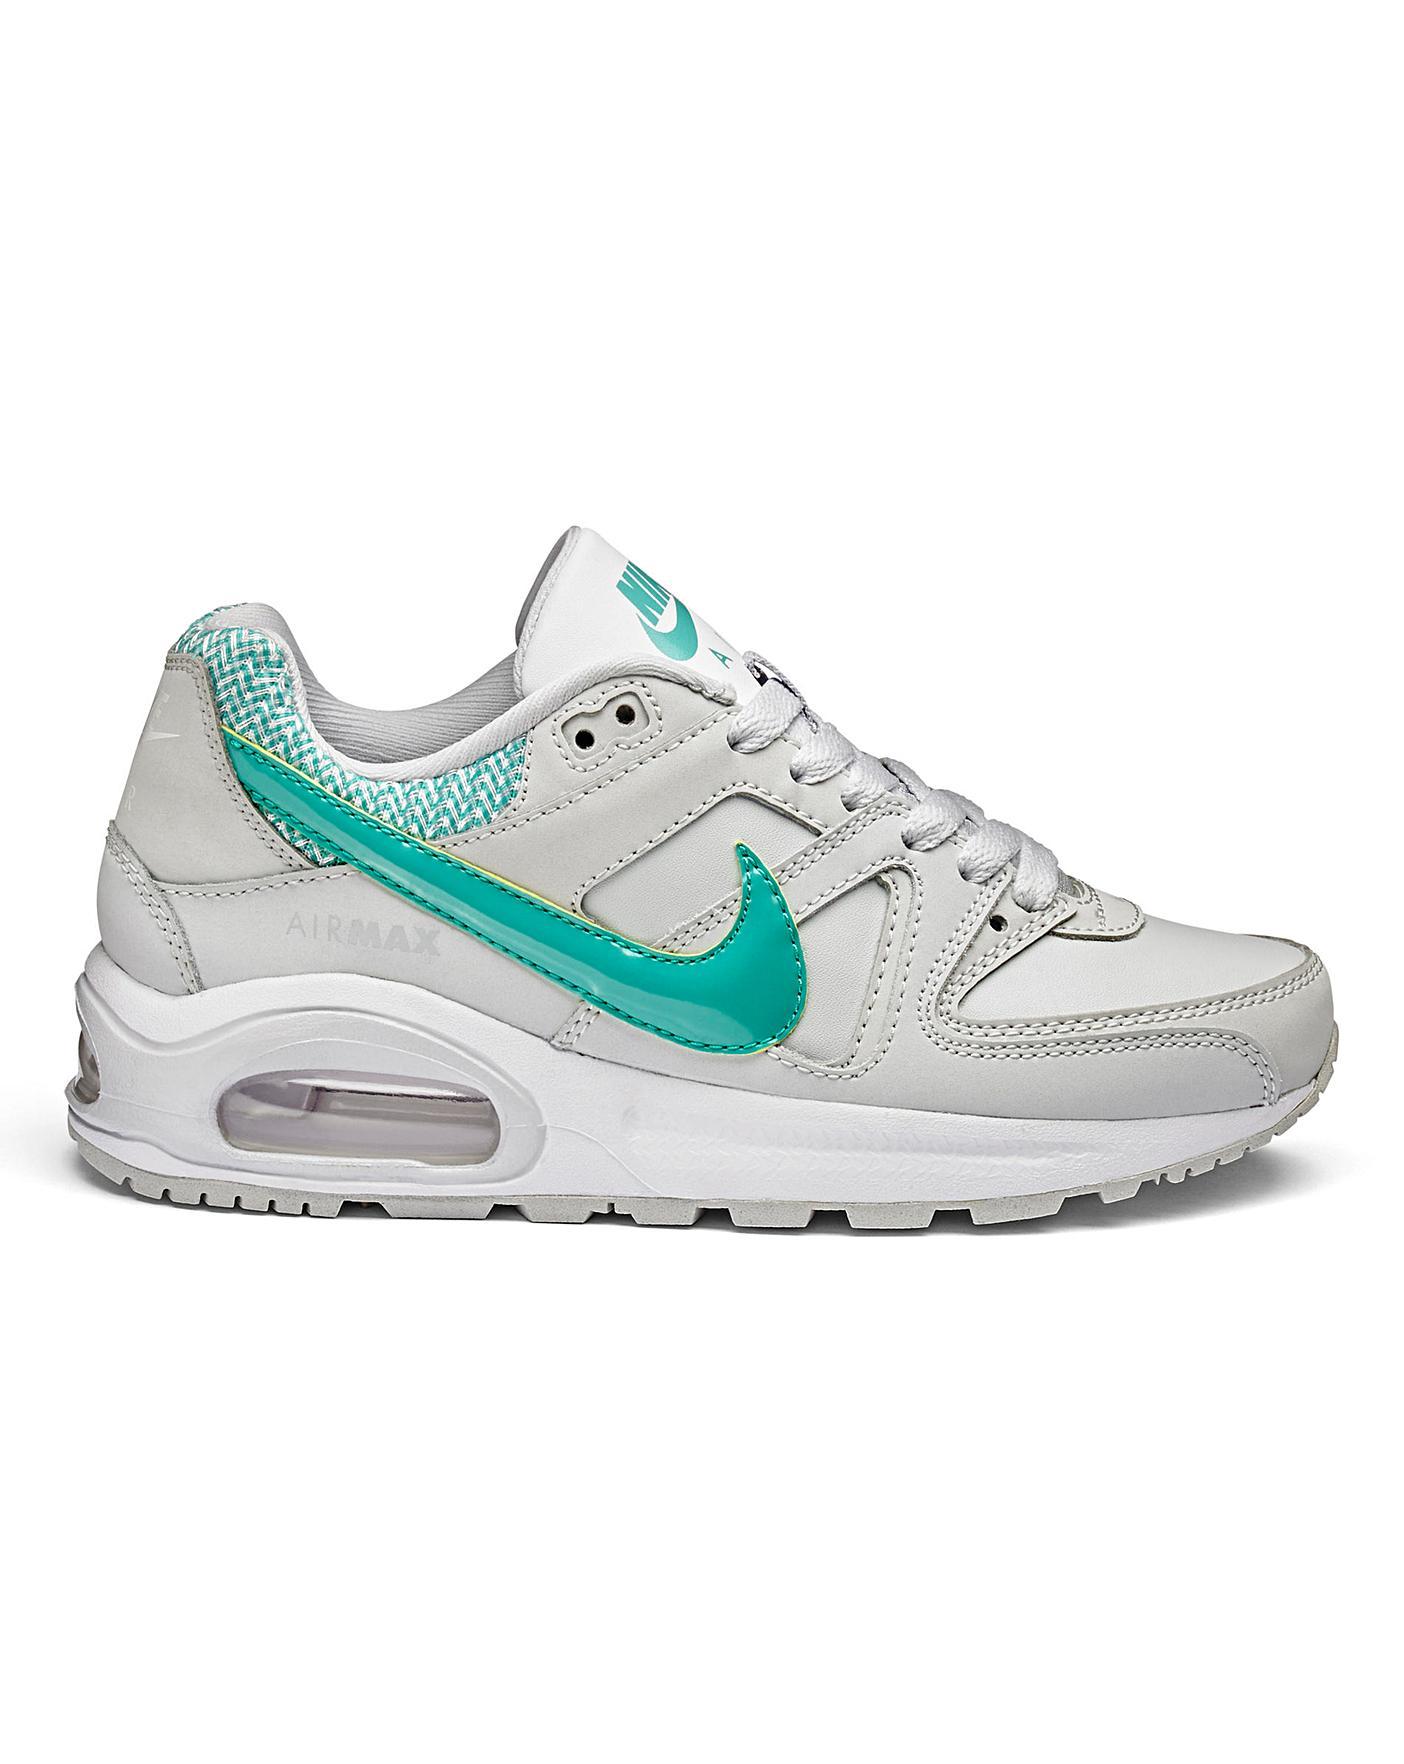 site réputé be24e e1199 Nike Air Max Command Flex Girls Trainers